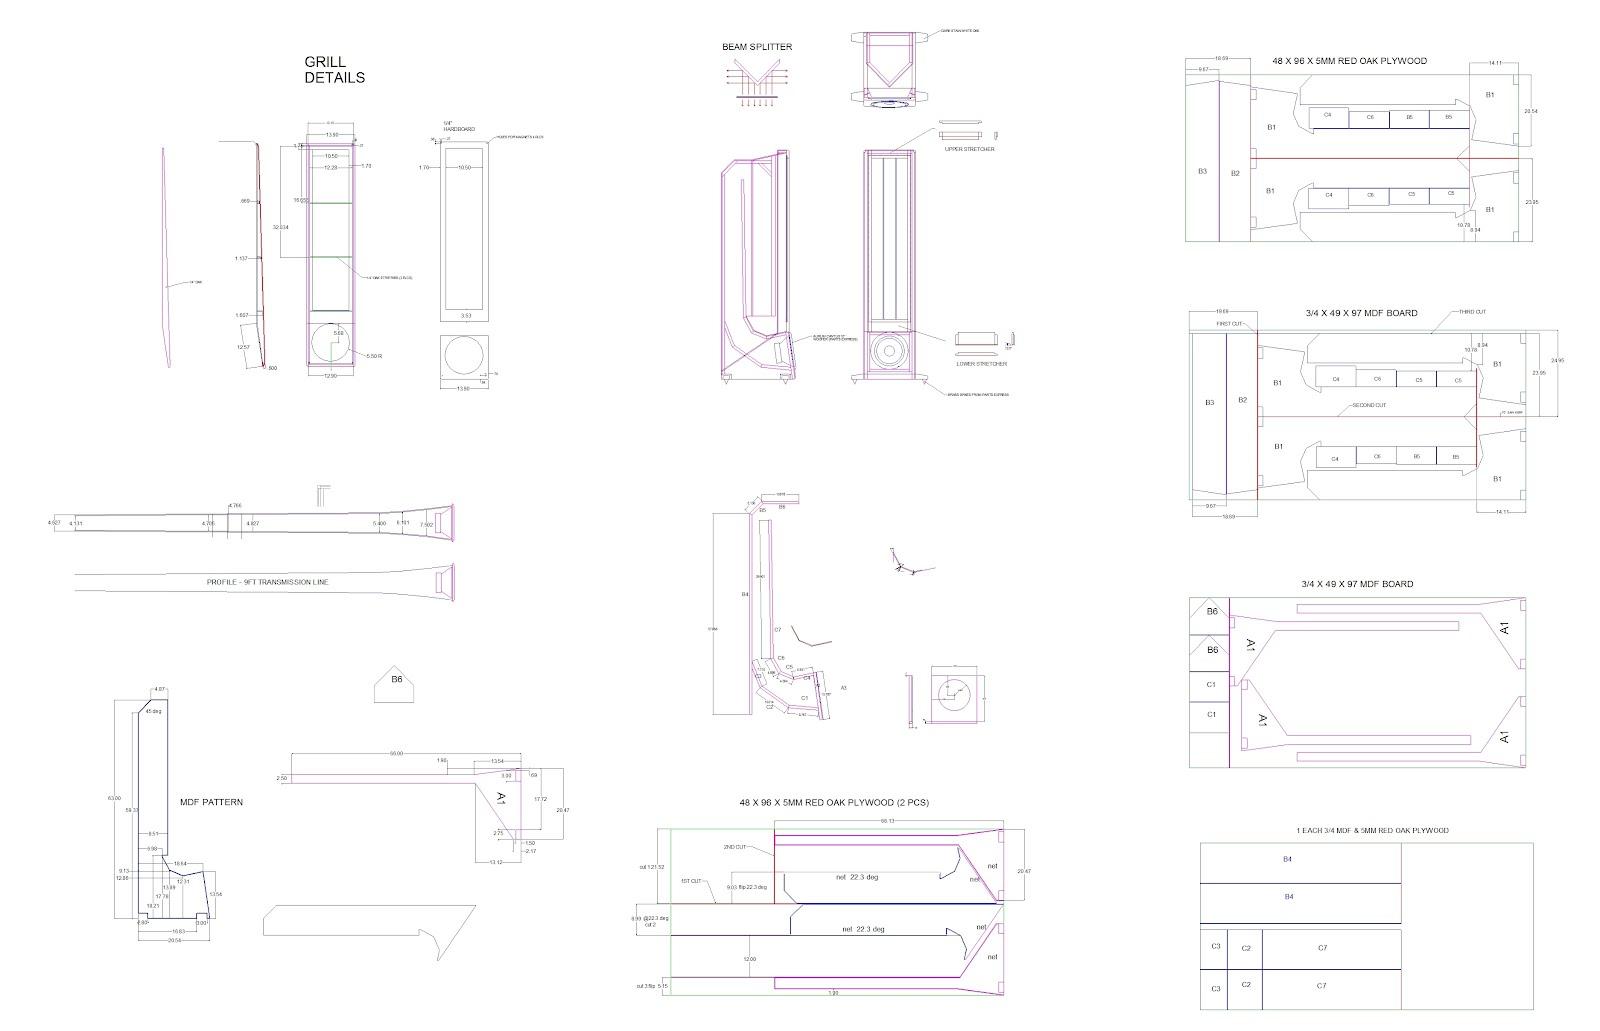 Bookshelf Speaker Wiring Diagram | Wiring Diagram Database